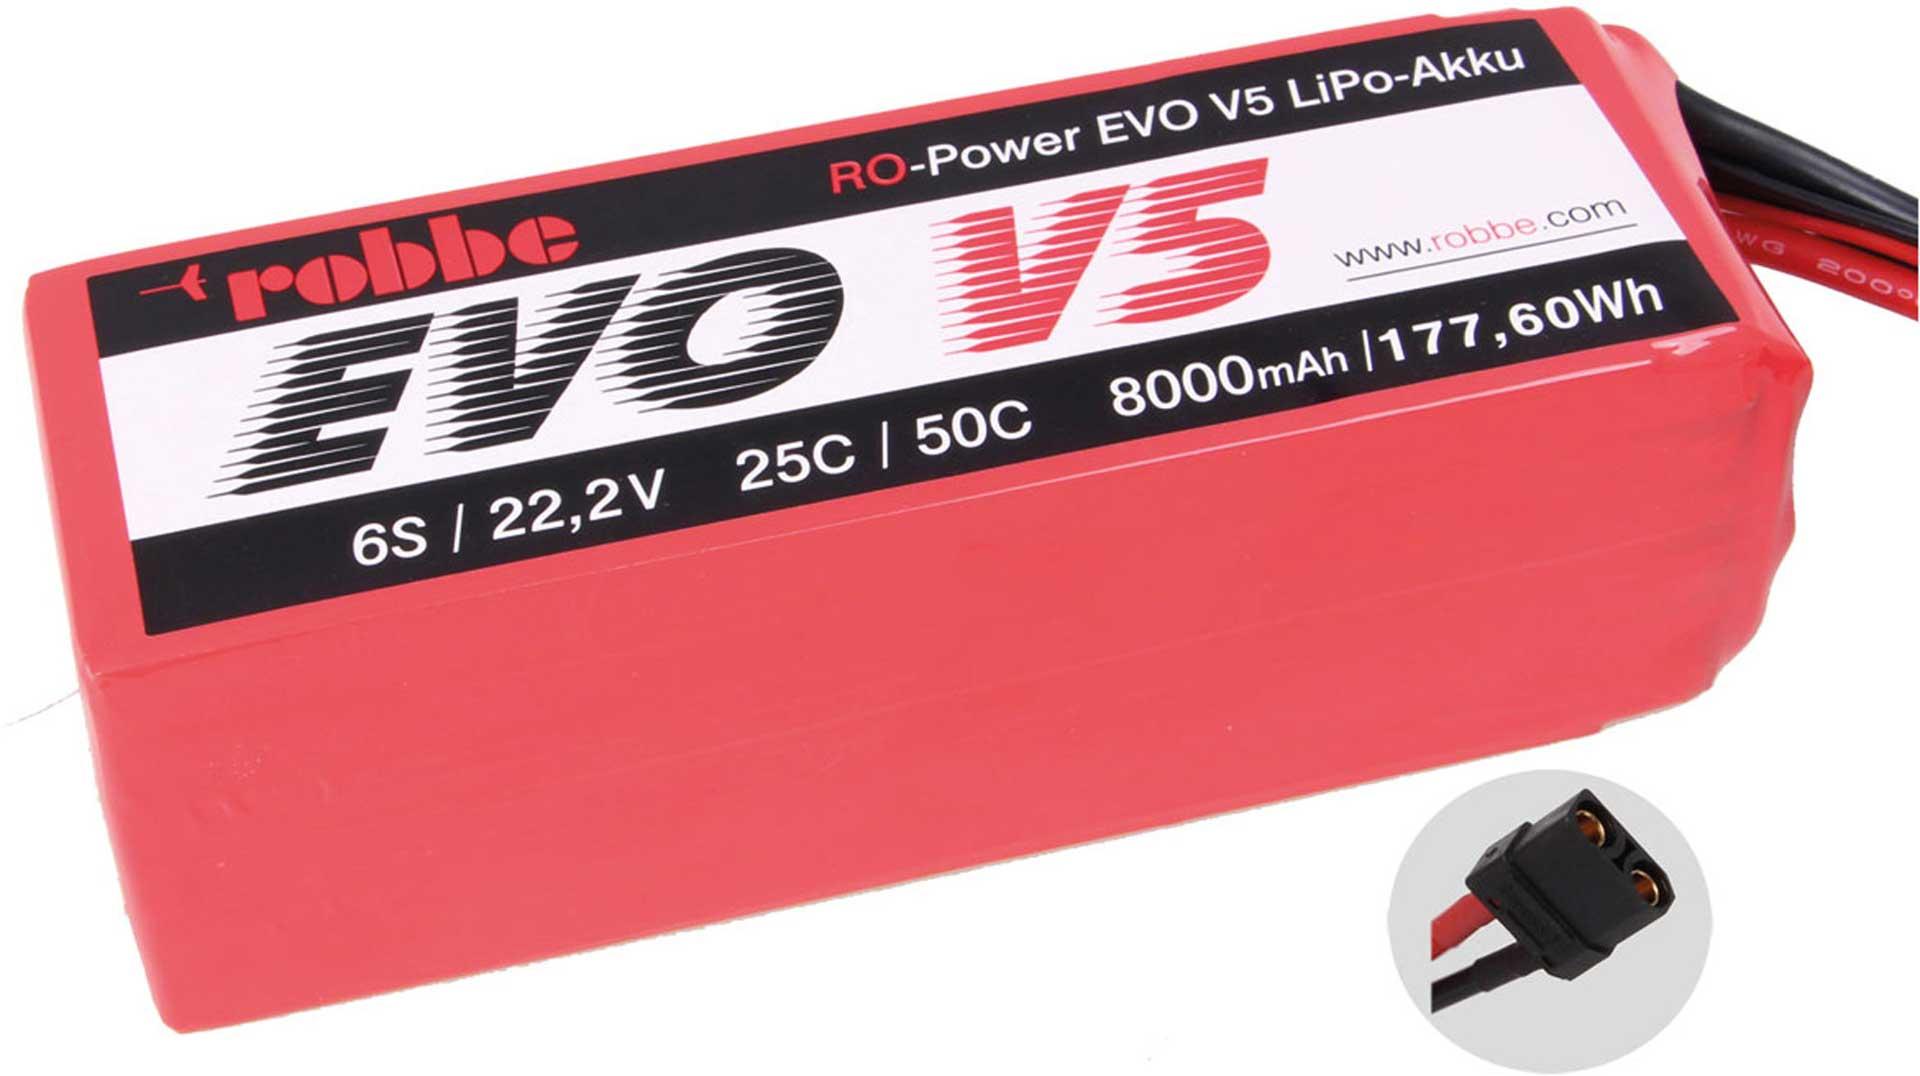 ROBBE RO-POWER EVO V5 25(50)C 22,2 VOLT 6S 8000MAH LIPO BATTERY